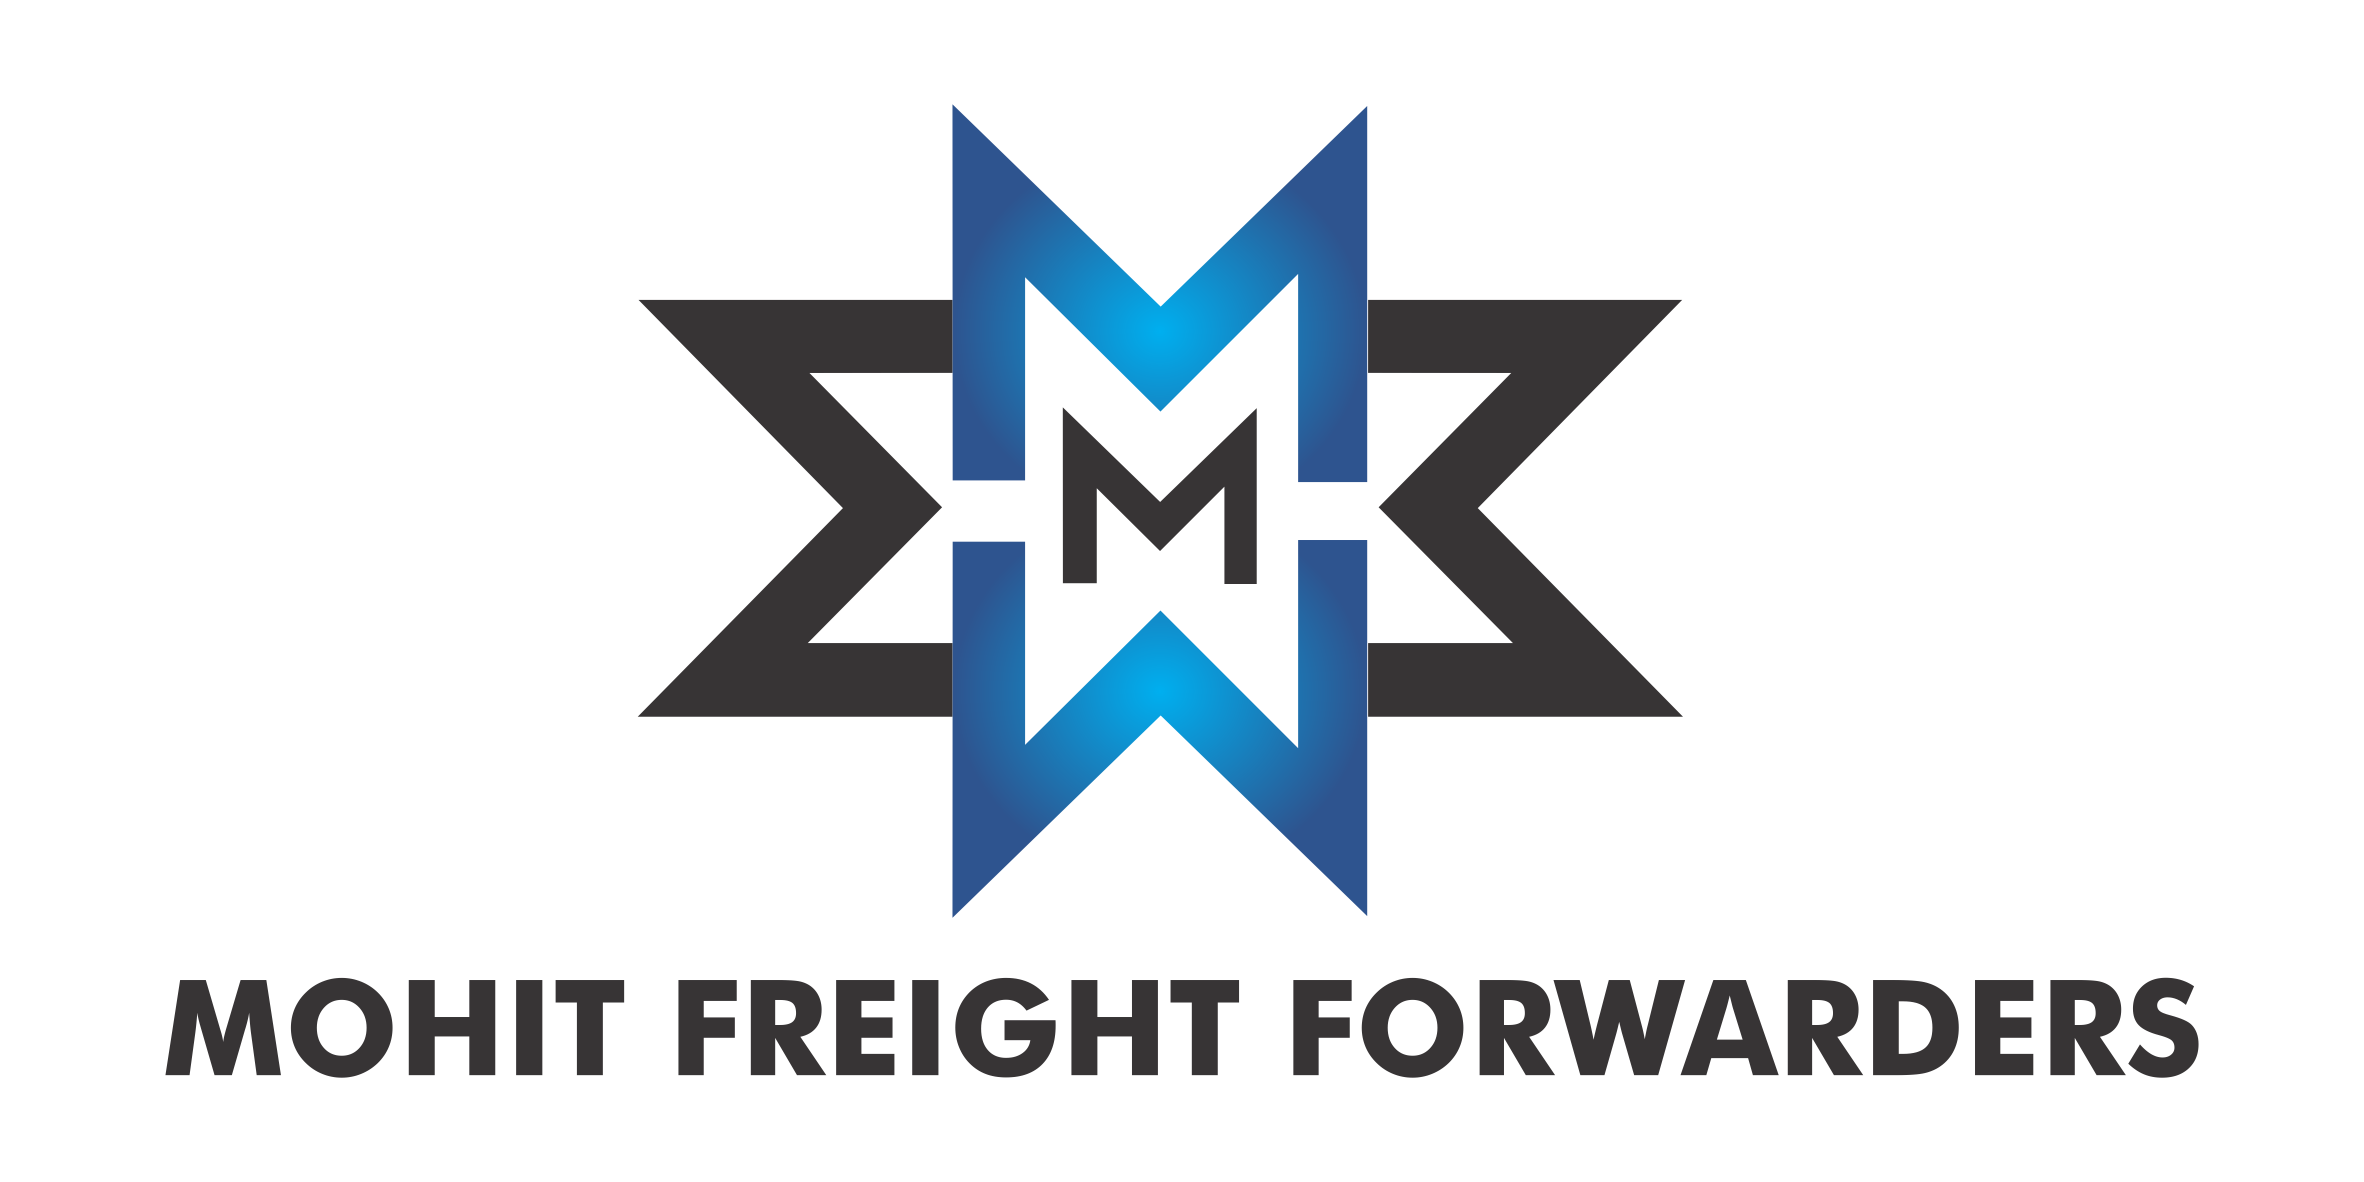 Mohit Freight Forwarders | Transportation | Navi Mumbai